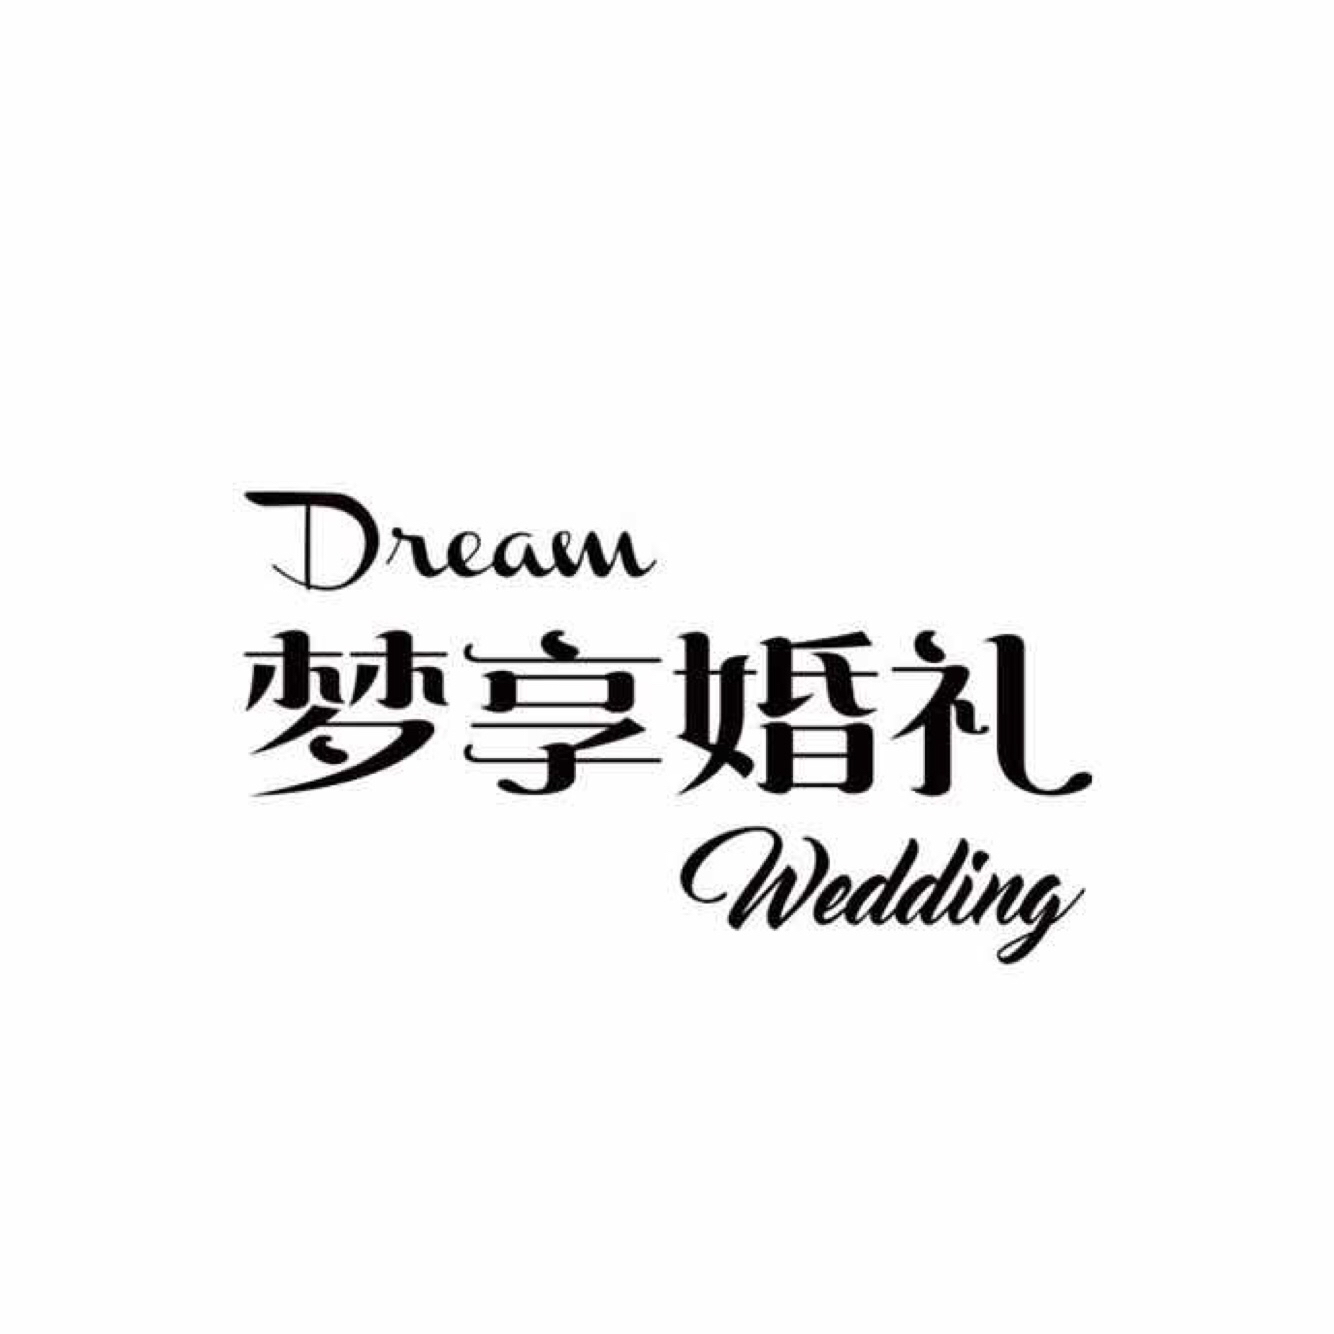 梦享婚礼Dreamwedding